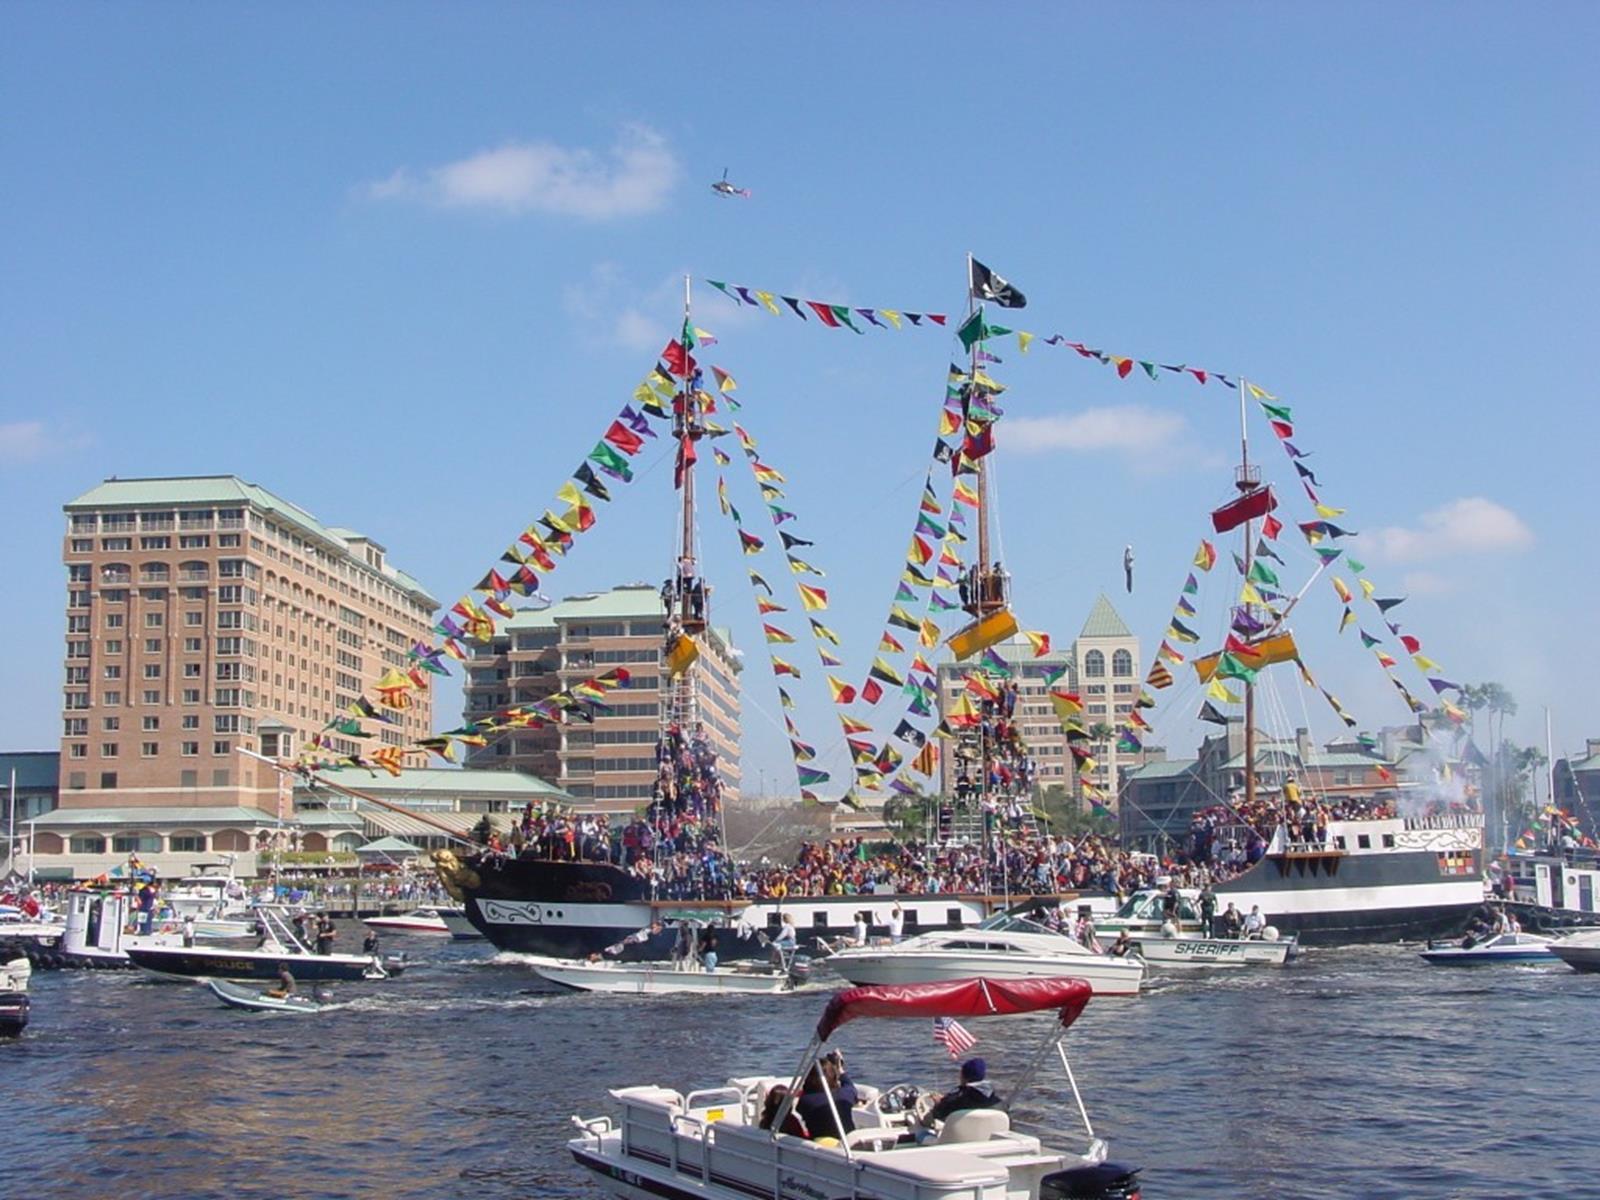 Gasparilla_Pirate_Fest_2003_-_Pirate_Flagship_Invading_Tampa